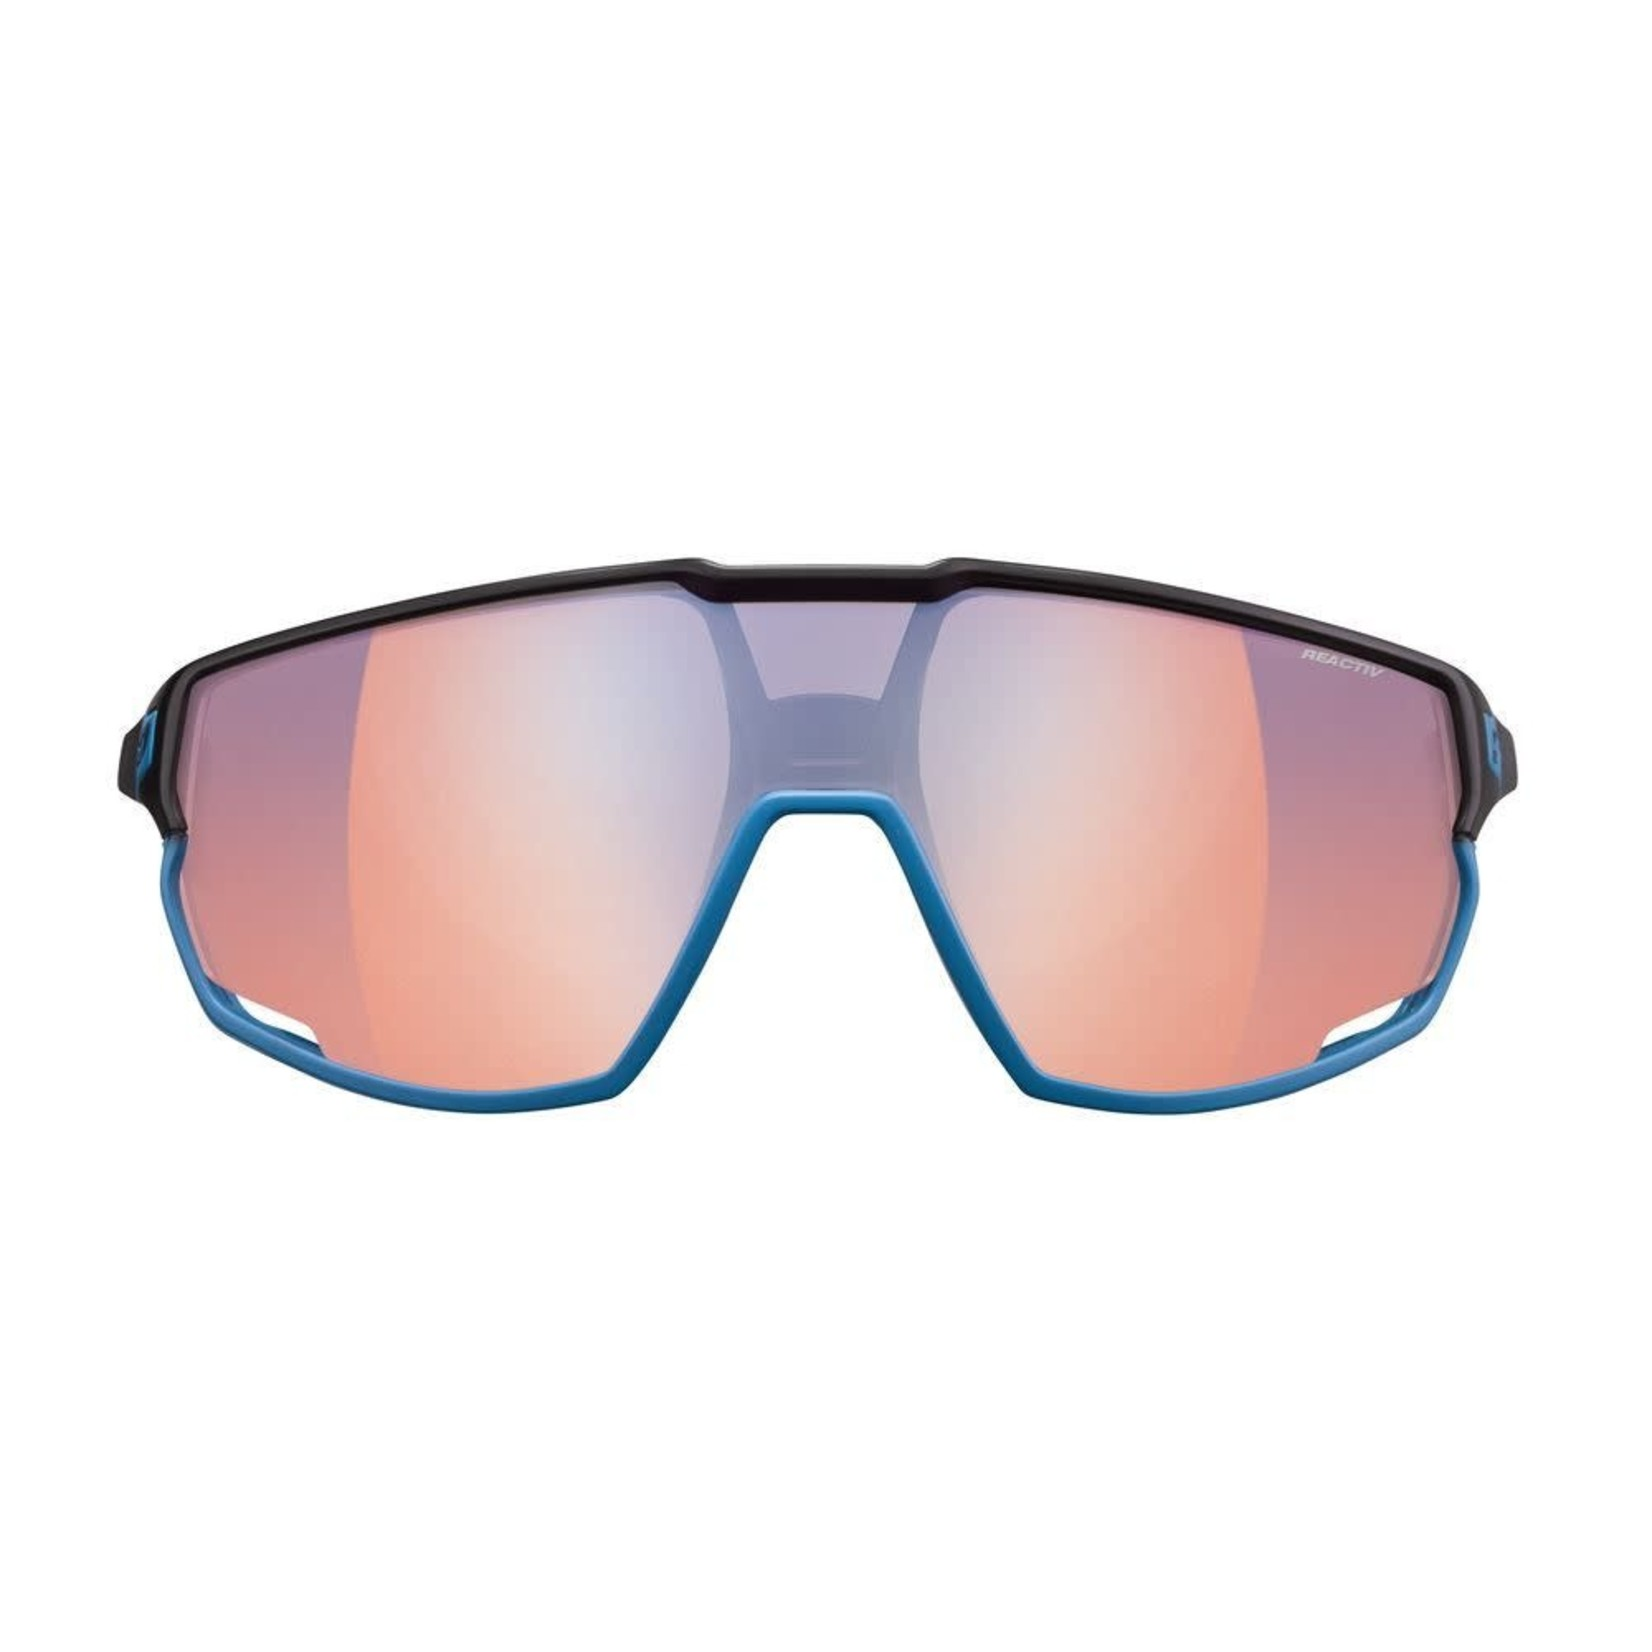 Julbo Julbo occhiali Rush blu/nero Reactiv Performance 1-3